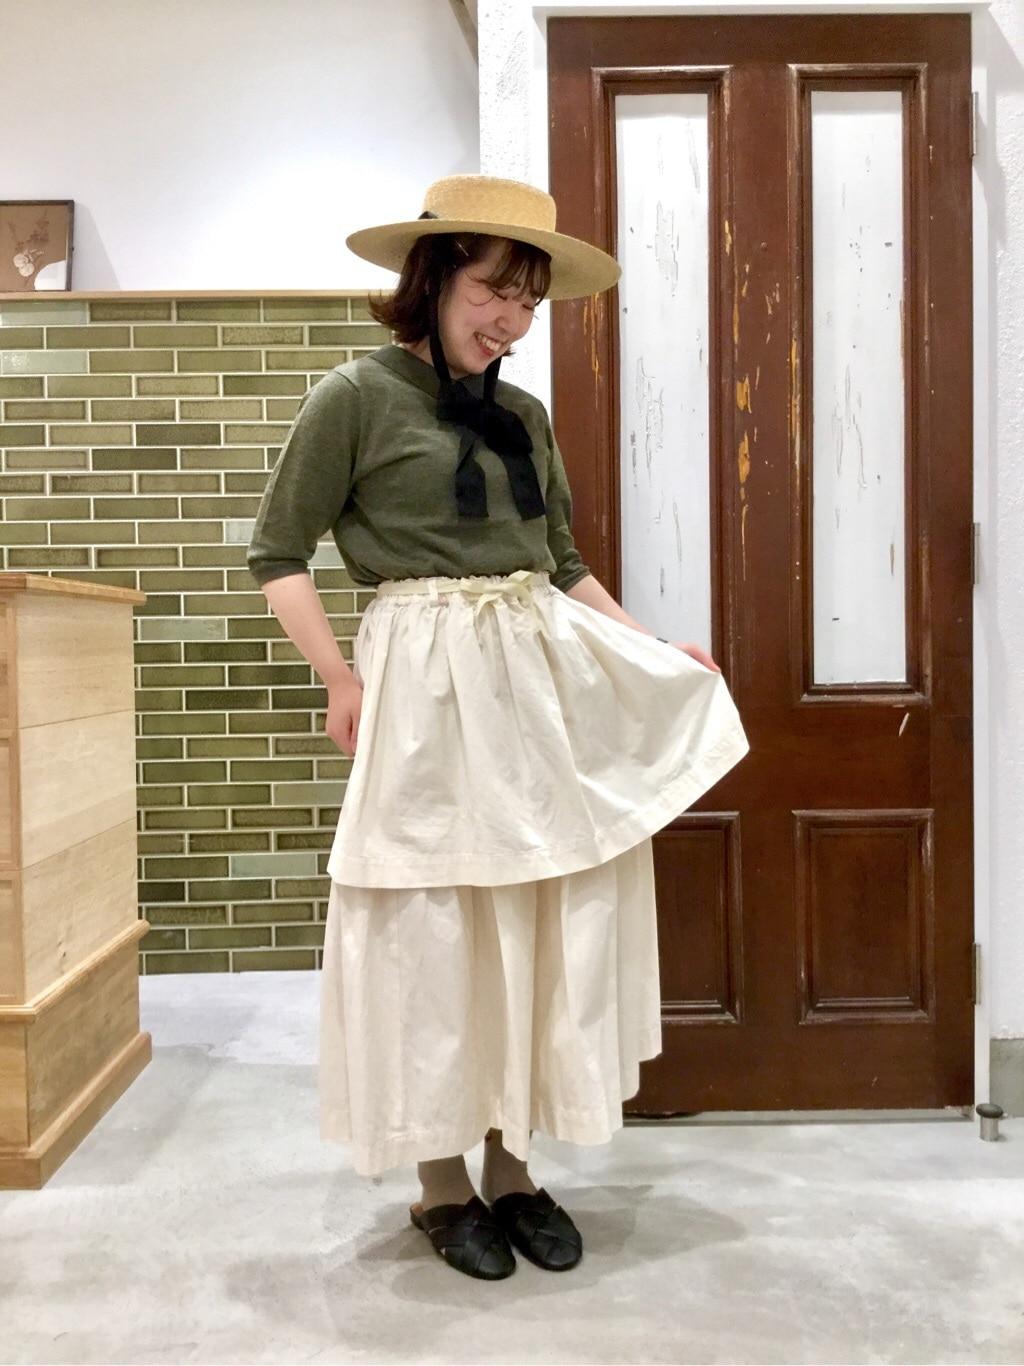 FLAT AMB 名古屋栄路面 2020.07.09